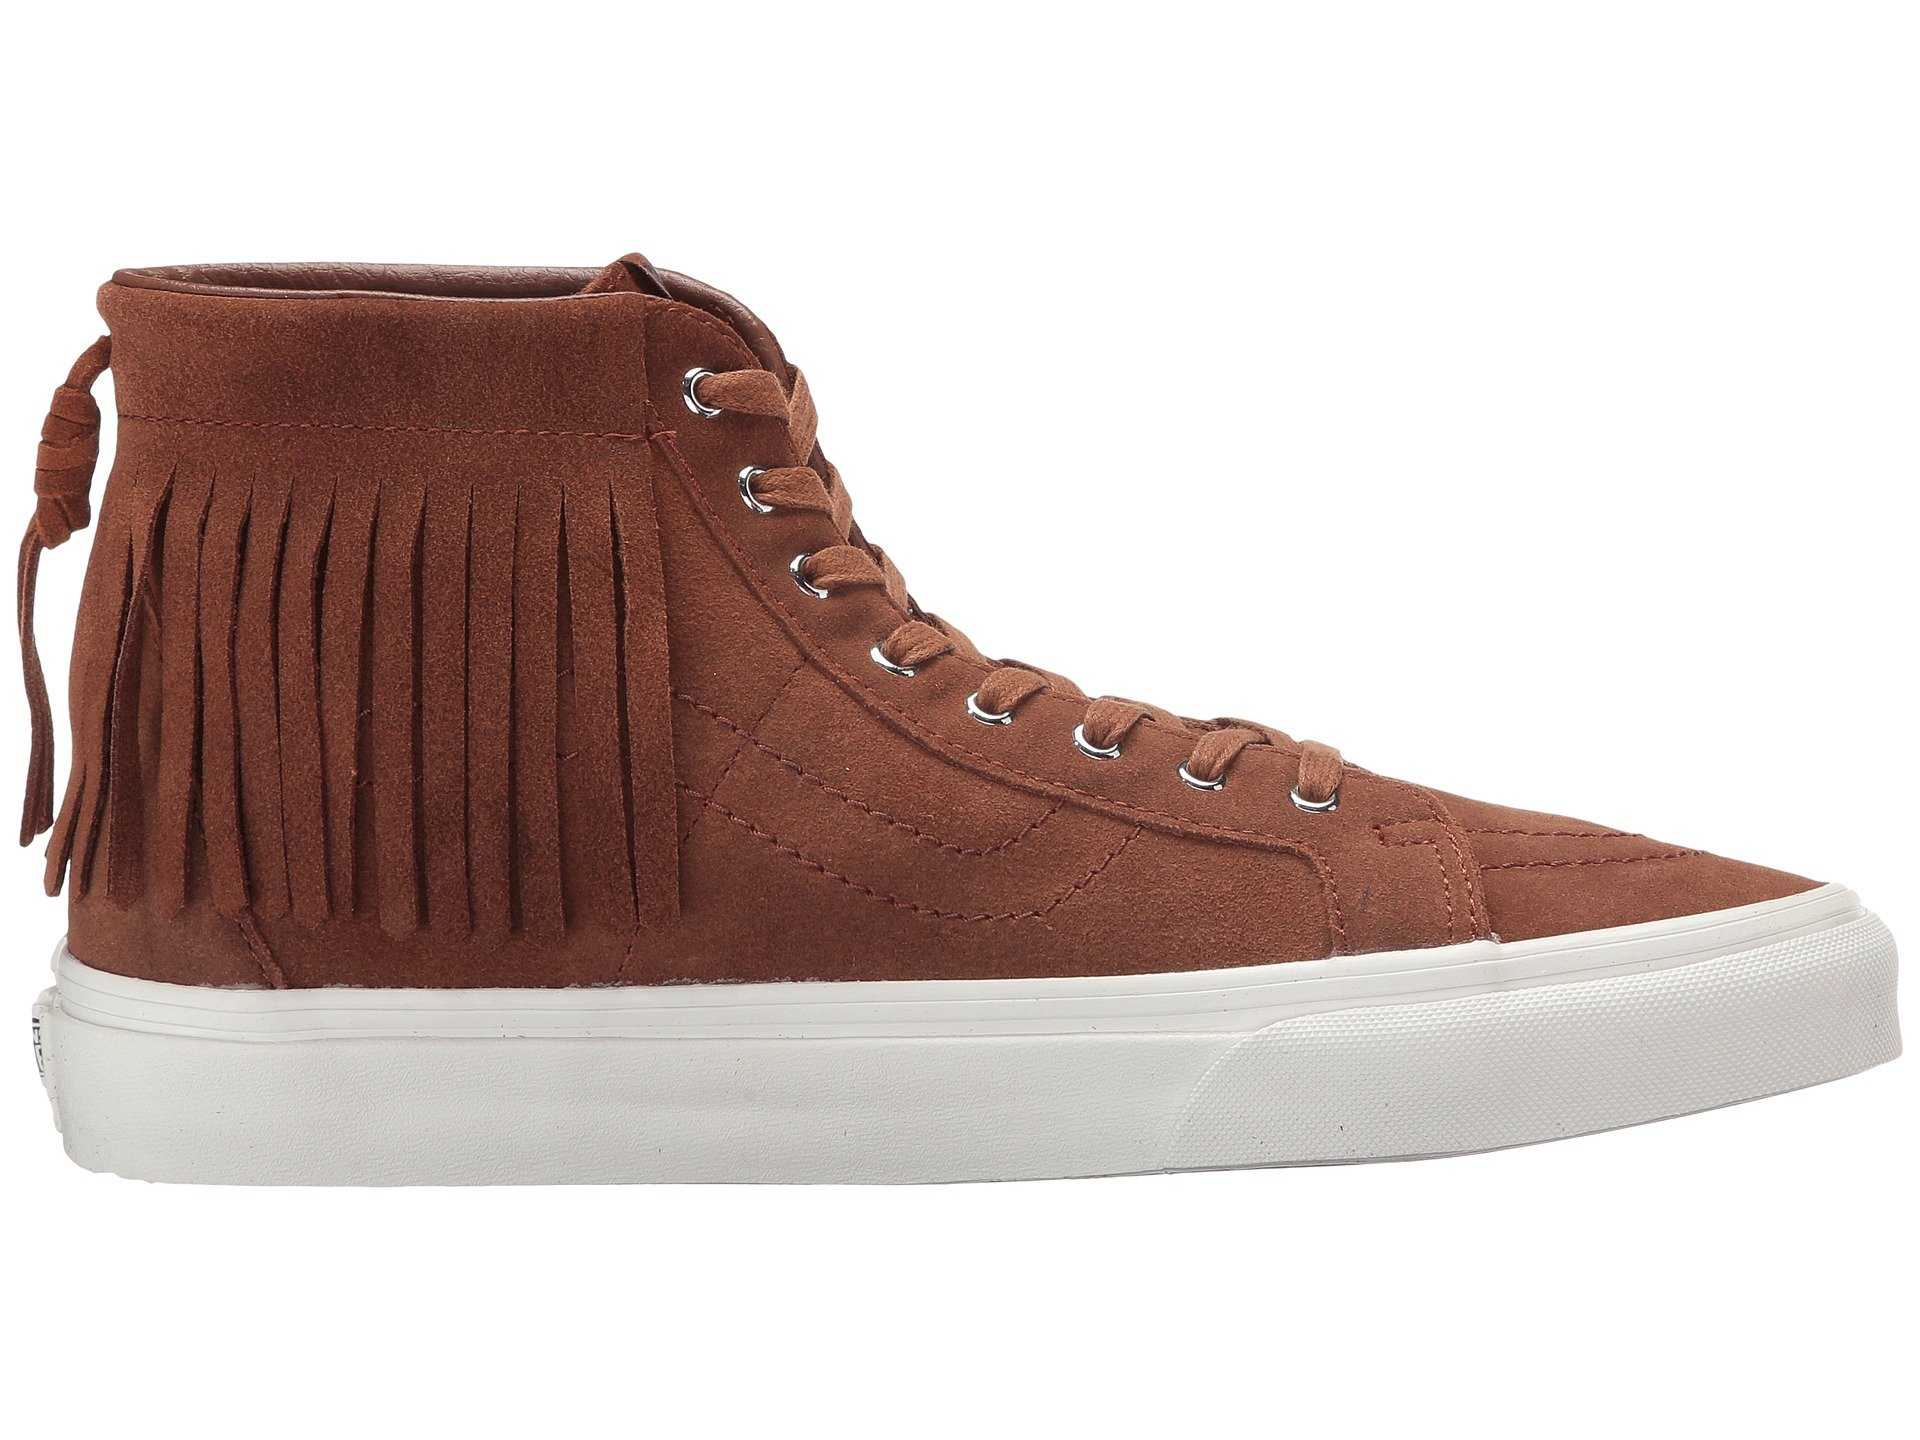 ebe44109ab Vans - Vans Sk8-Hi Moc Suede Monks Robe   Blanc De Ankle-High Fashion  Sneaker - 8.5M 7M - Walmart.com